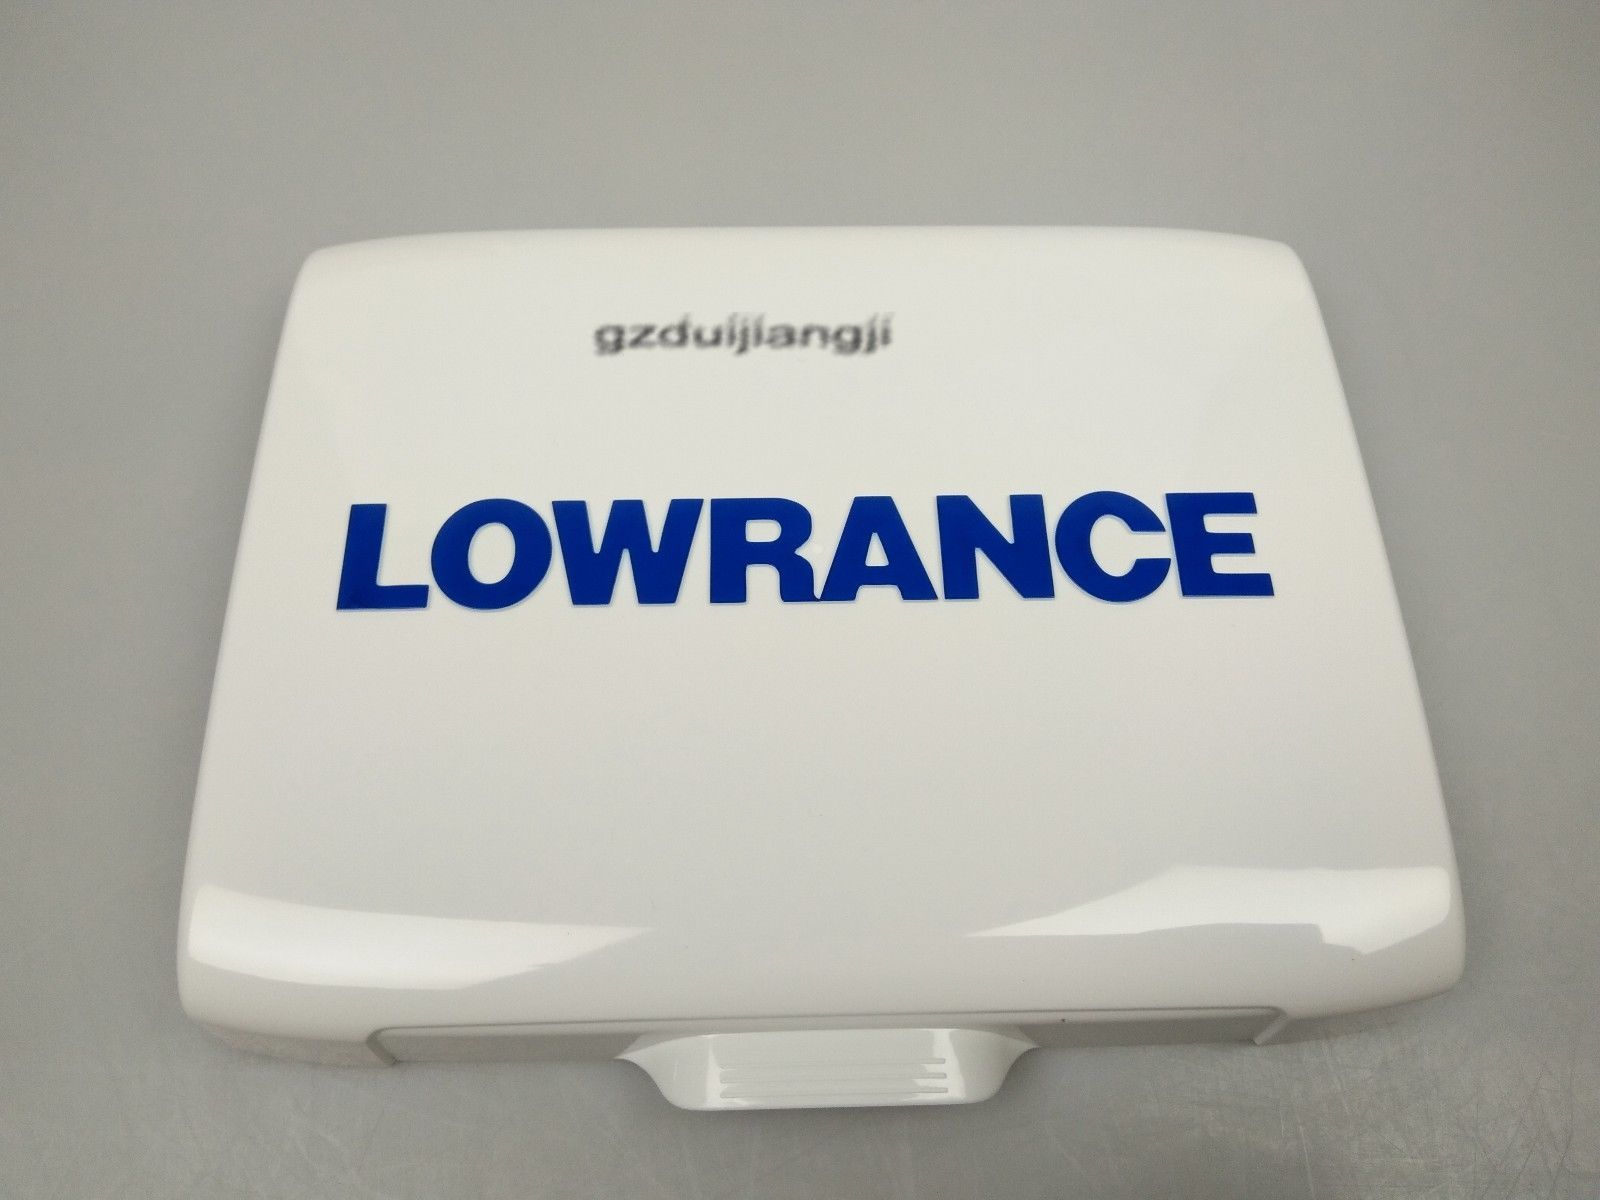 Lowrance Fishfinders Consumer Electronics Gps navigation